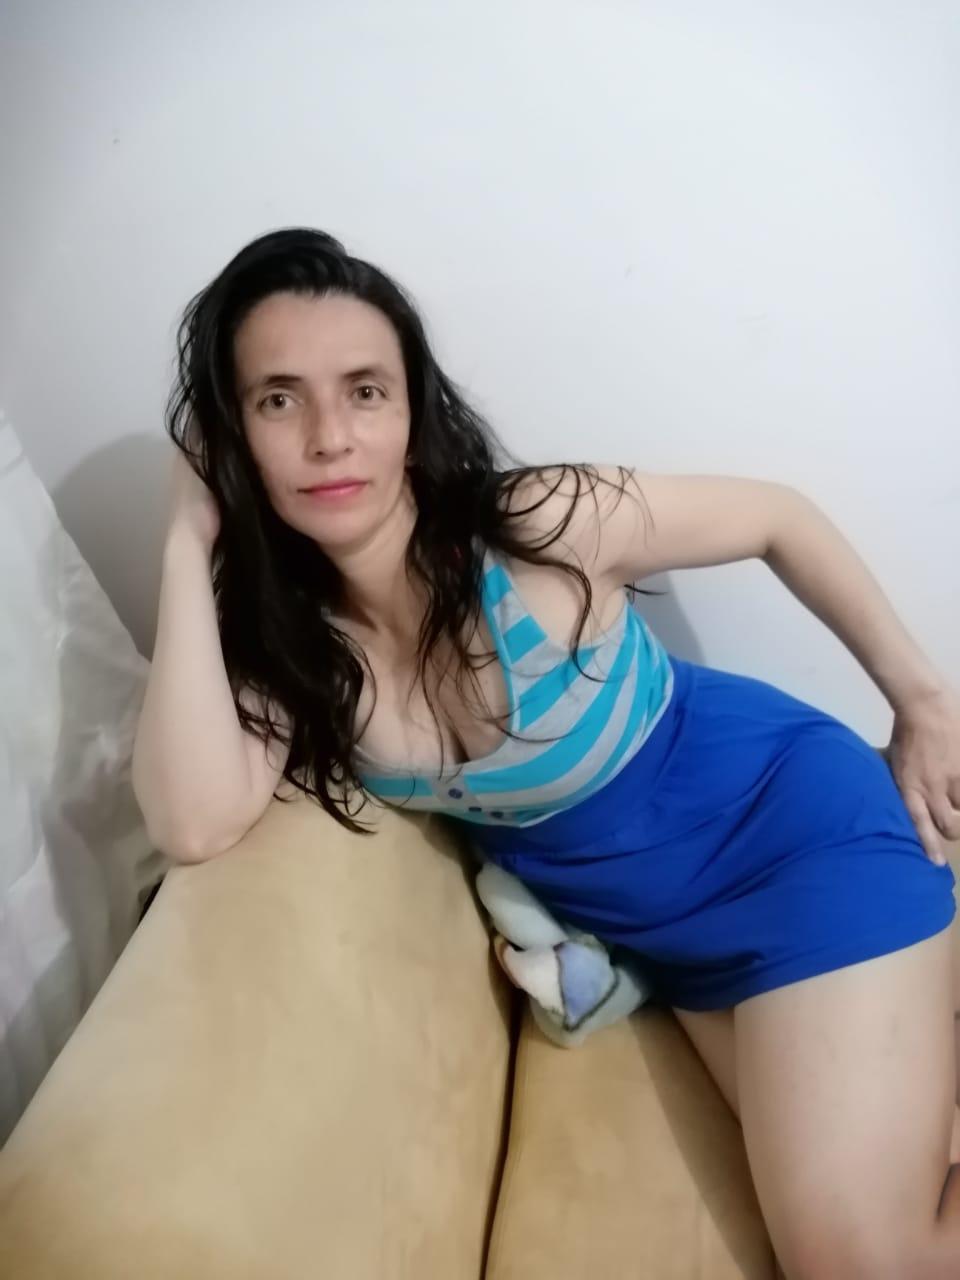 Sexycreazy?s=fvfmwjqpabgjb4p692wt465w4ykvziwju3kcosyrjj0=